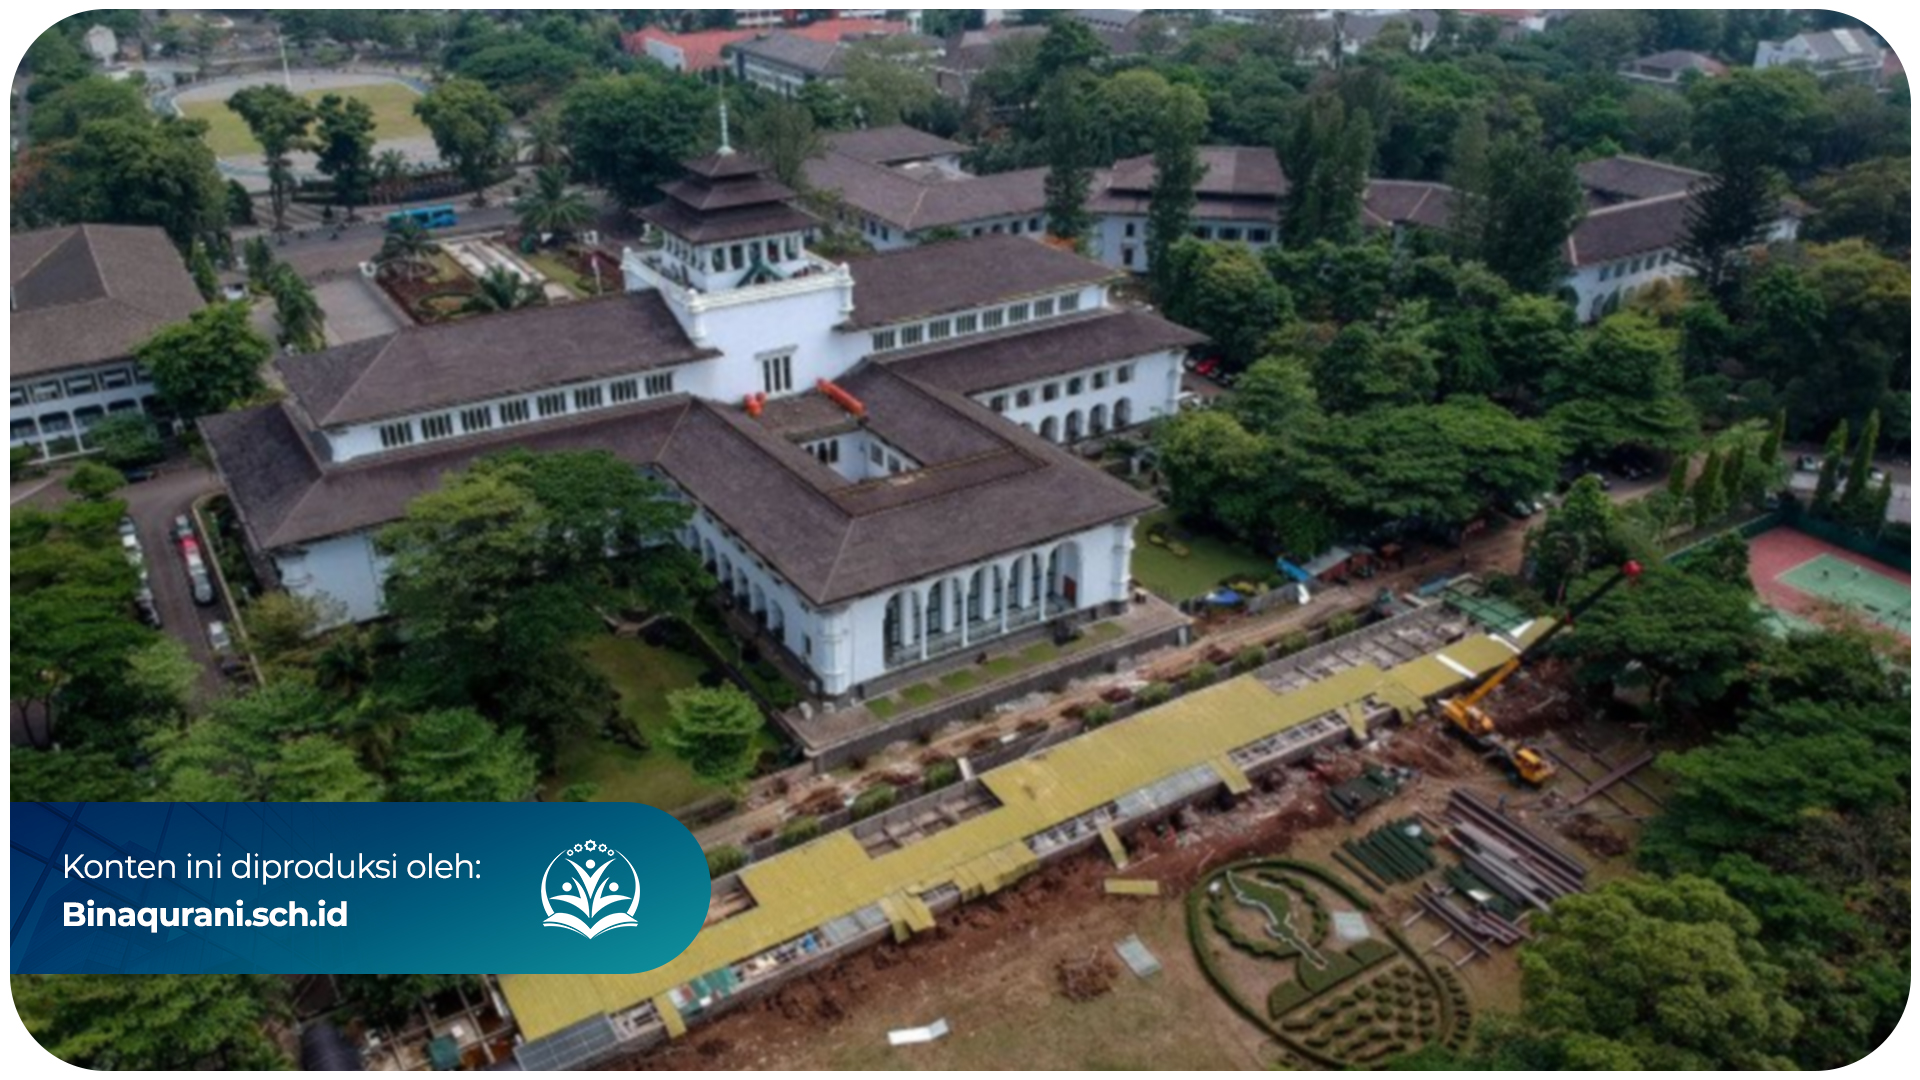 Bina-Qurani-Gedung-Bersejarah-di-Bandung